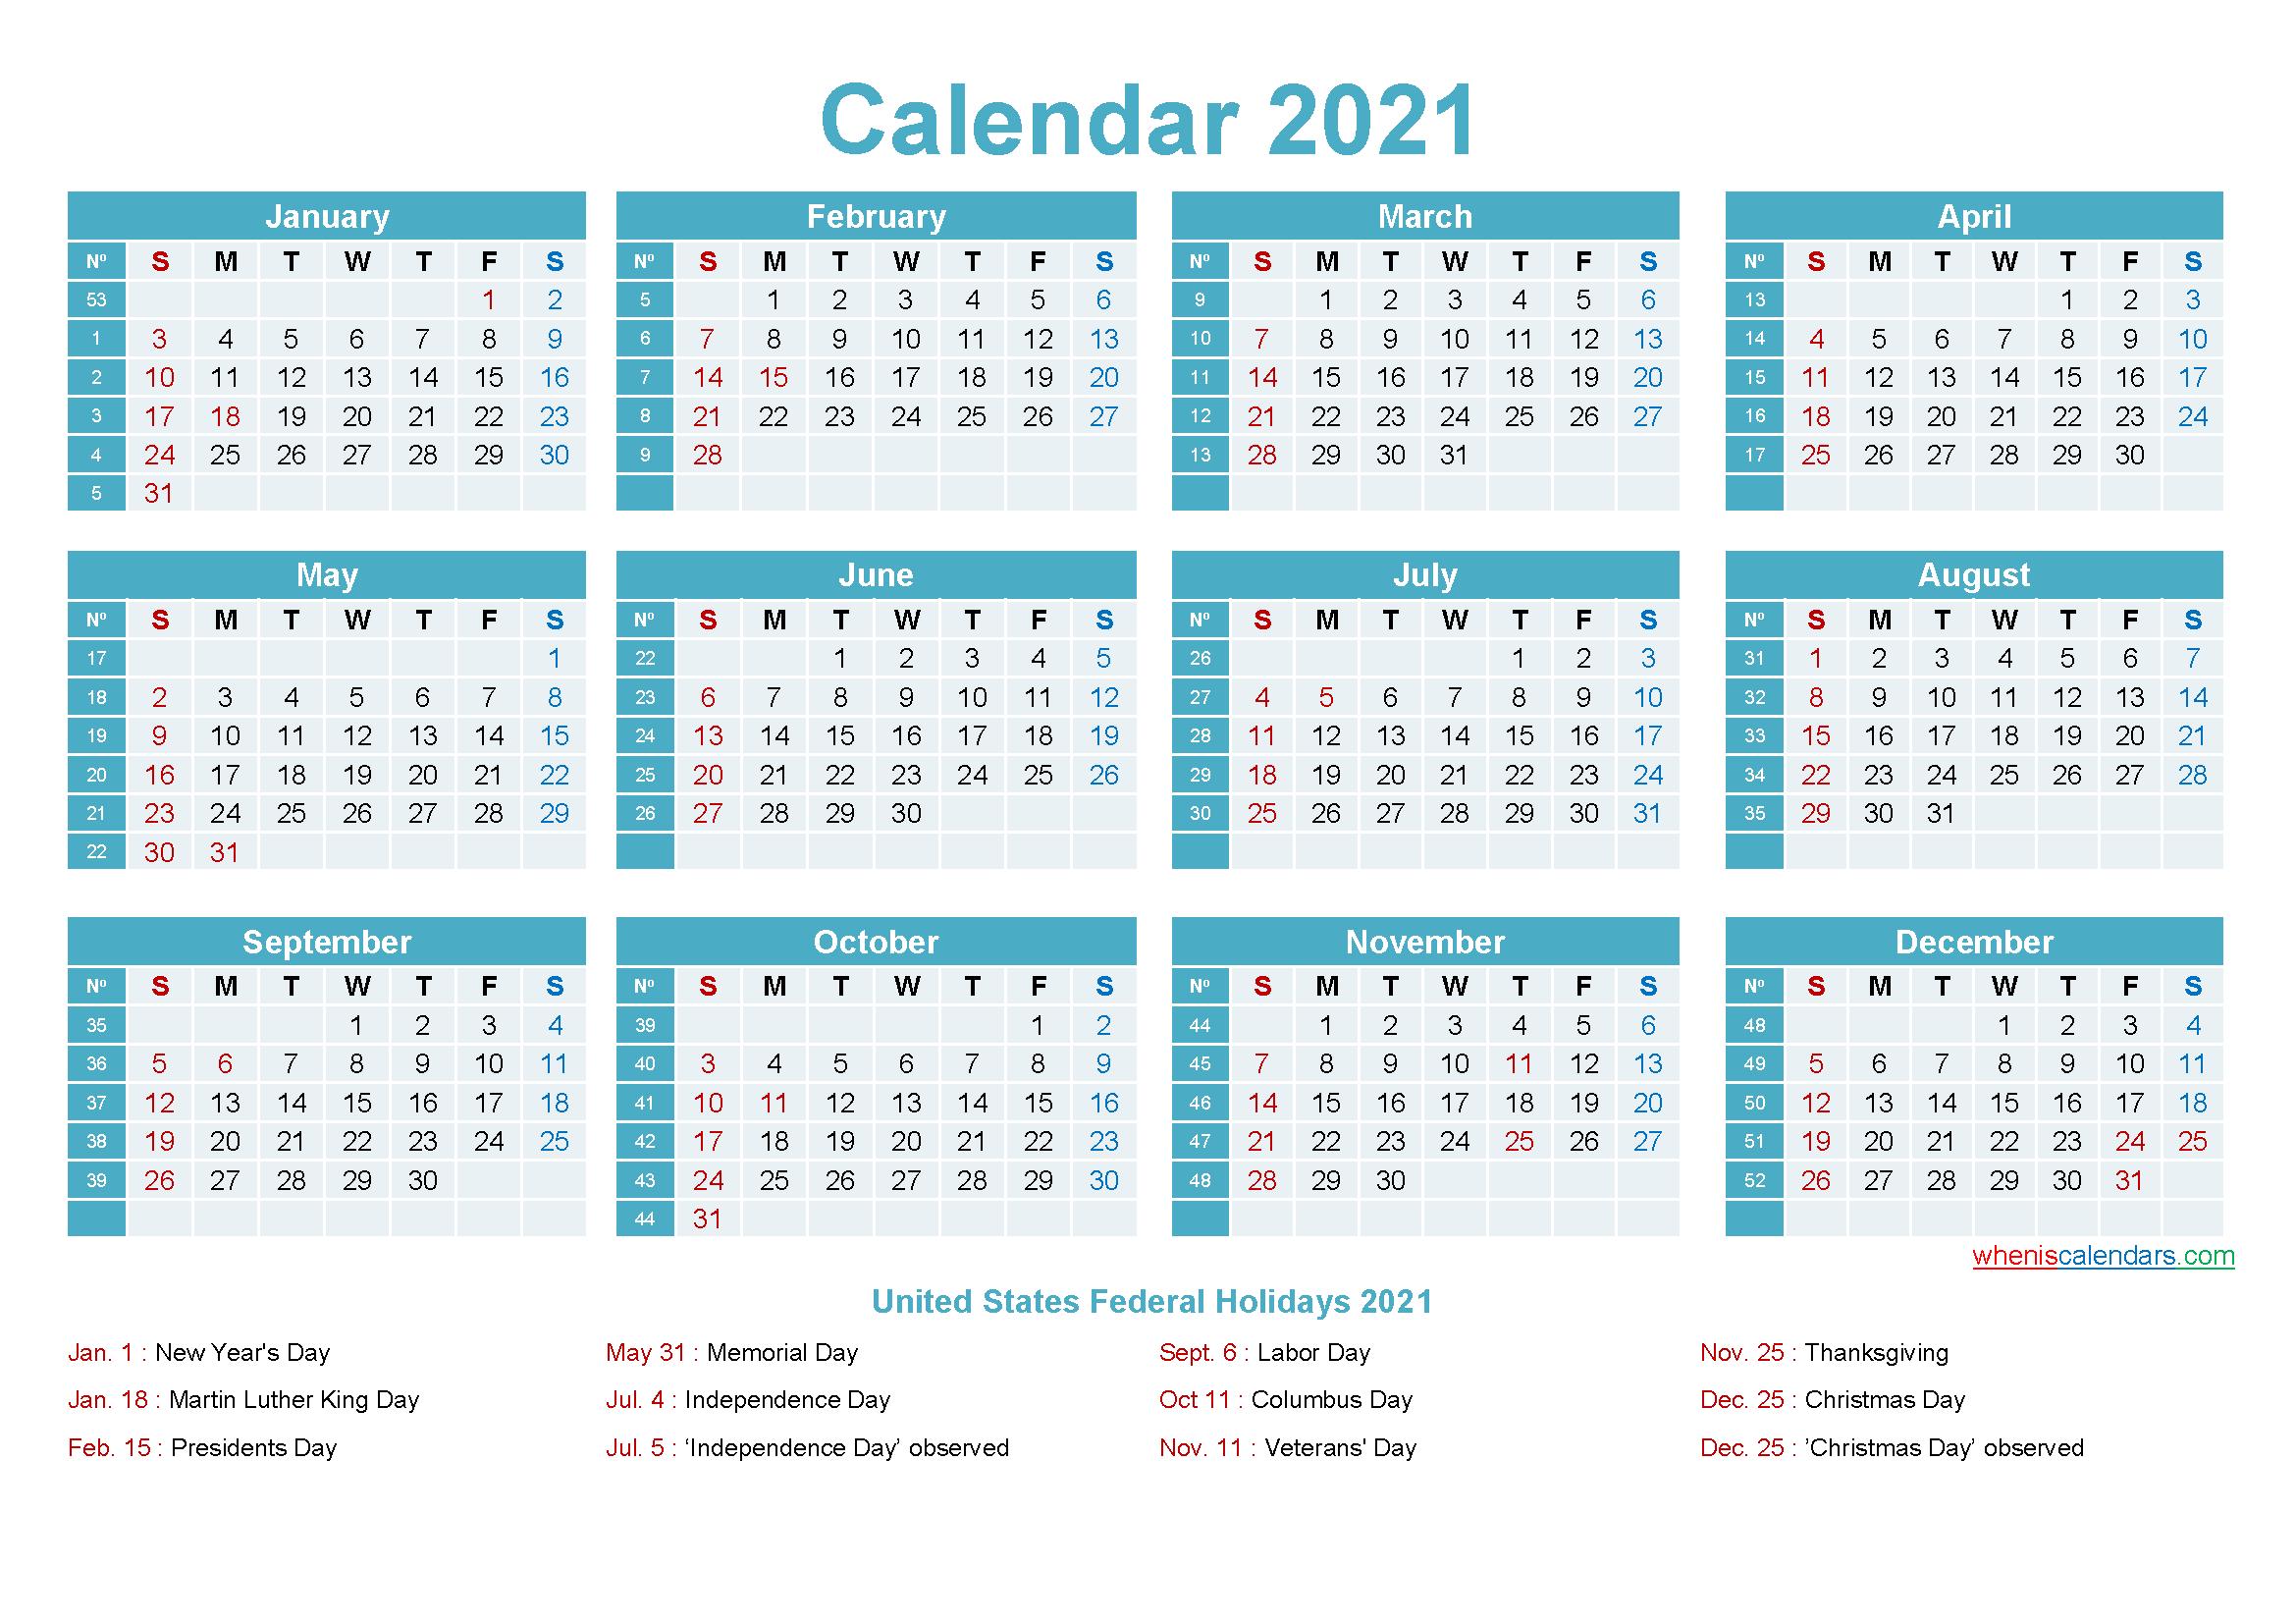 2021 Calendar With Holidays Printable Word, Pdf - Free-Microsoft Word Calendar Template 2021